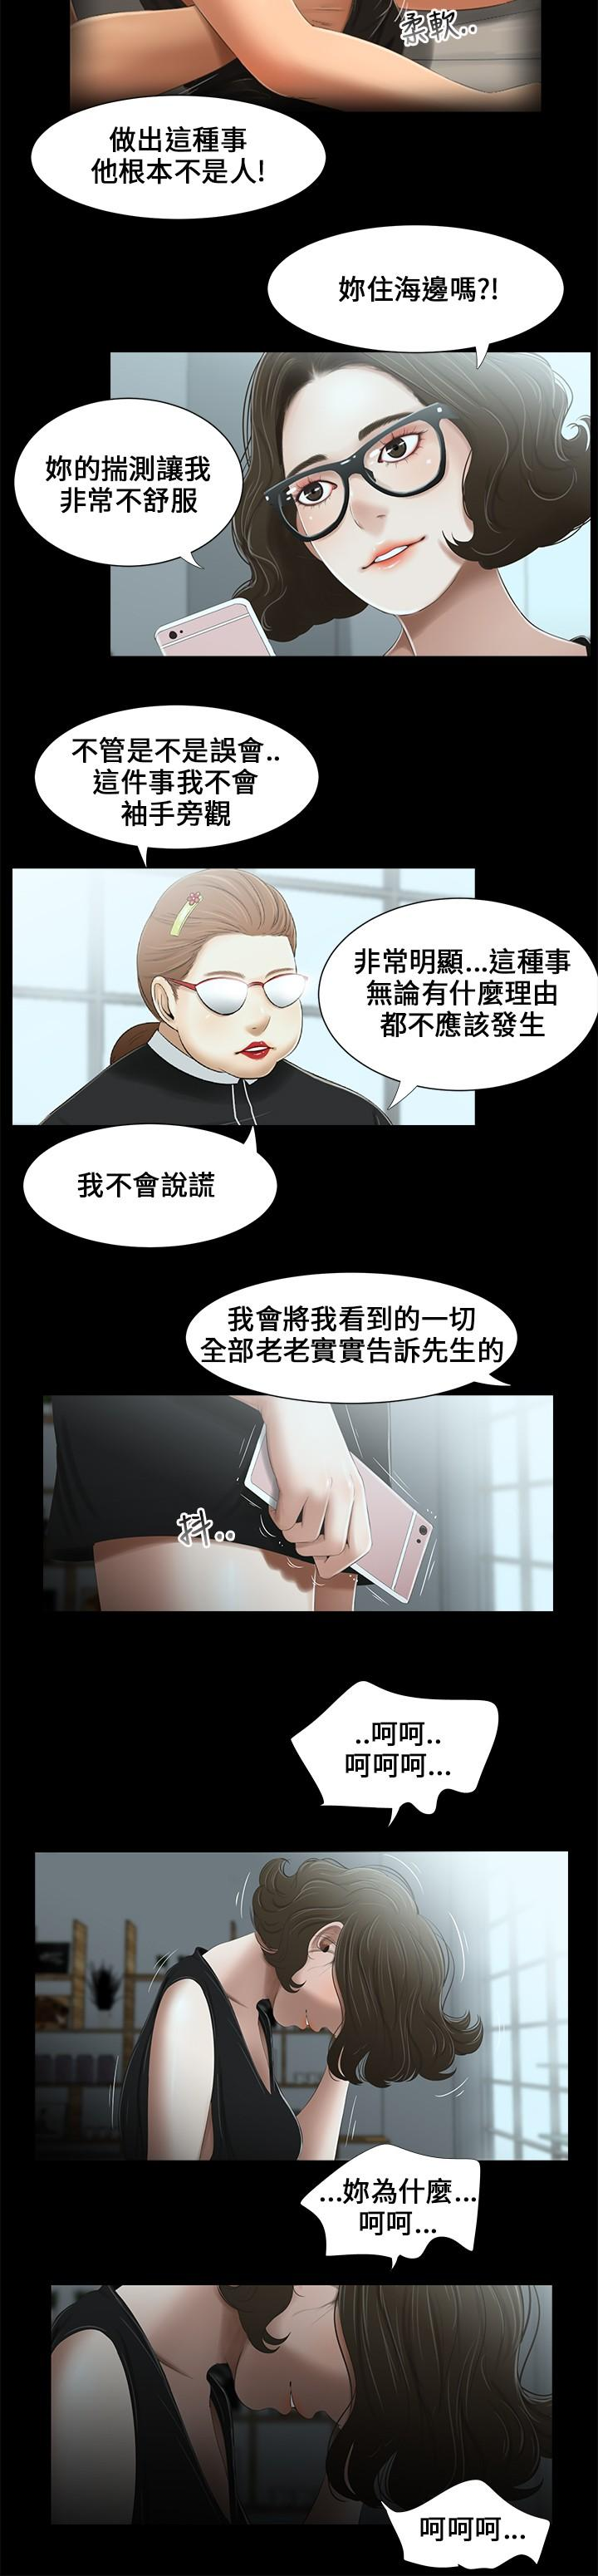 Three sisters 三姐妹Ch.13~19 (Chinese)中文 48